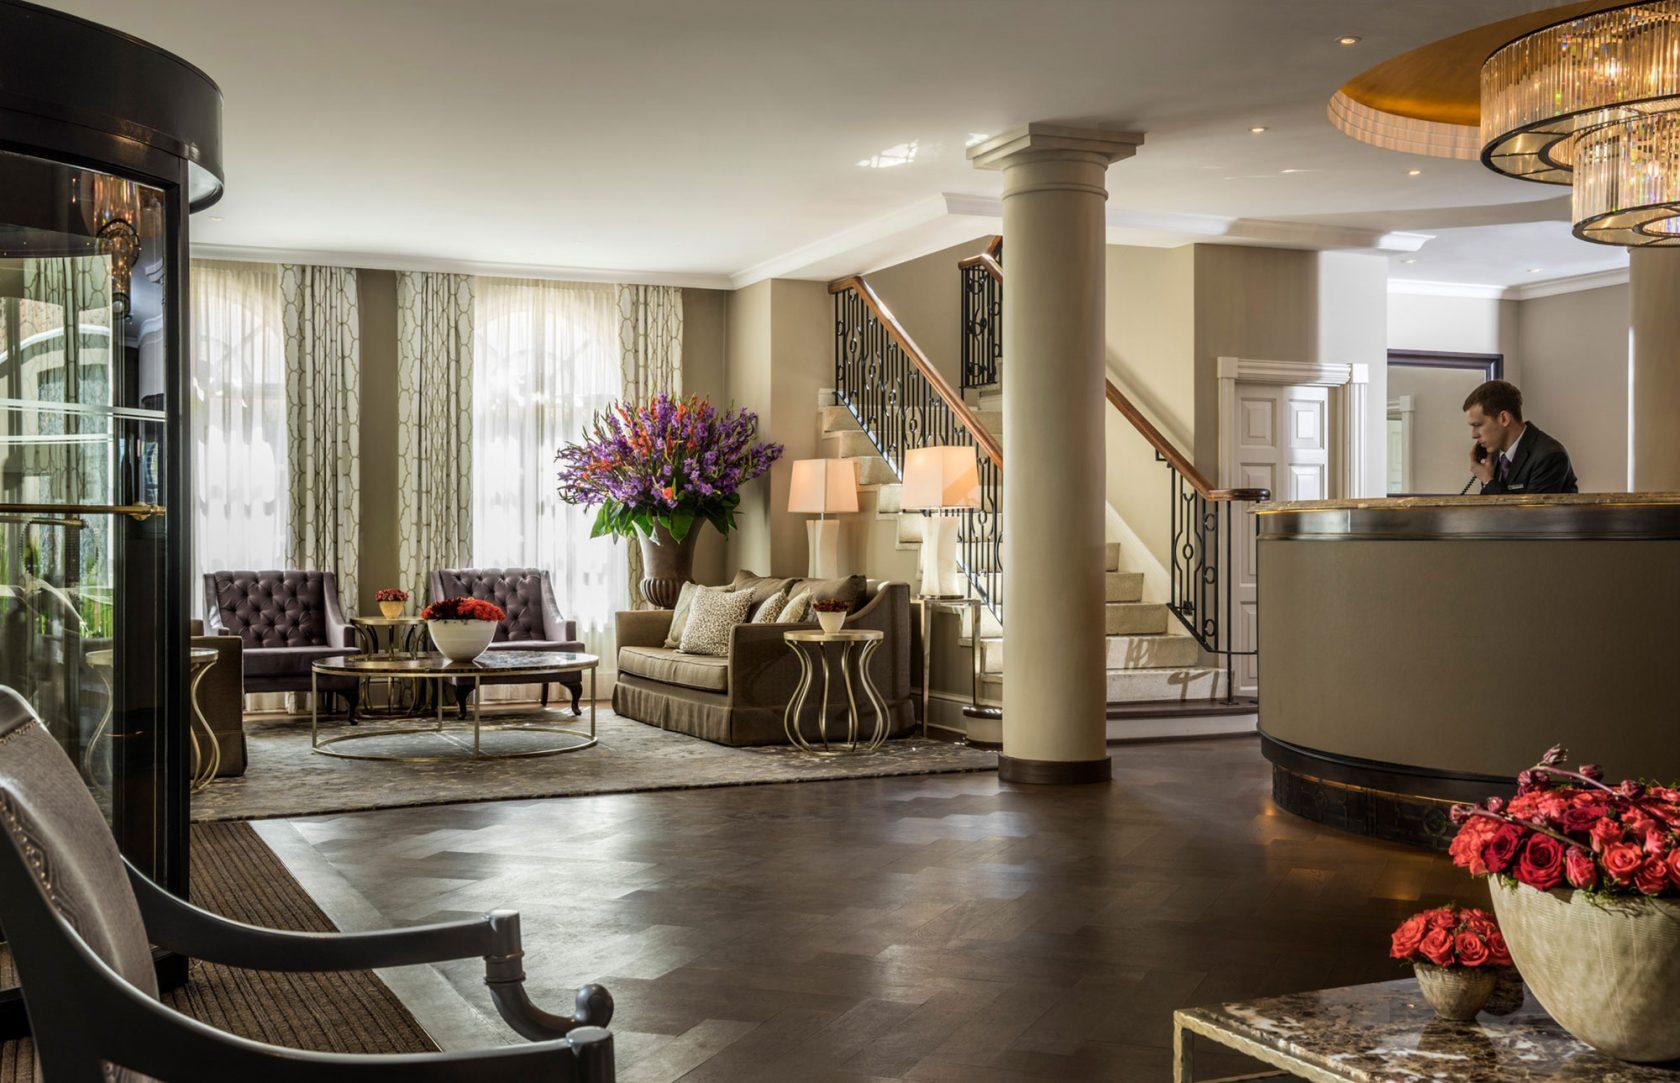 Four Seasons Hotel The Westcliff Lobby